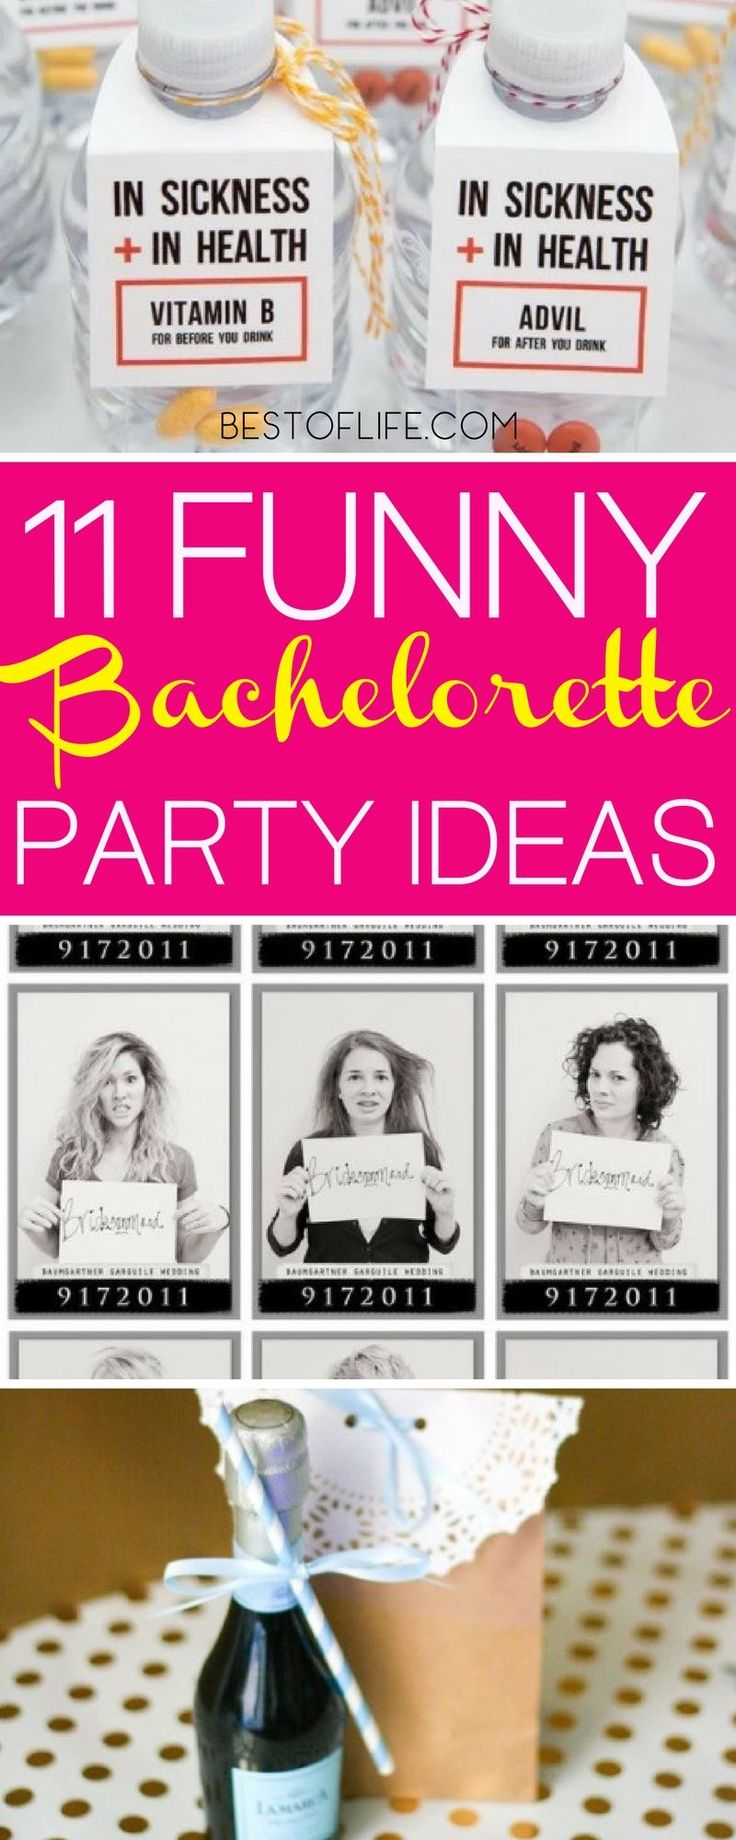 Clean & Fun Bachelorette Party Games | | TopWeddingSites.com